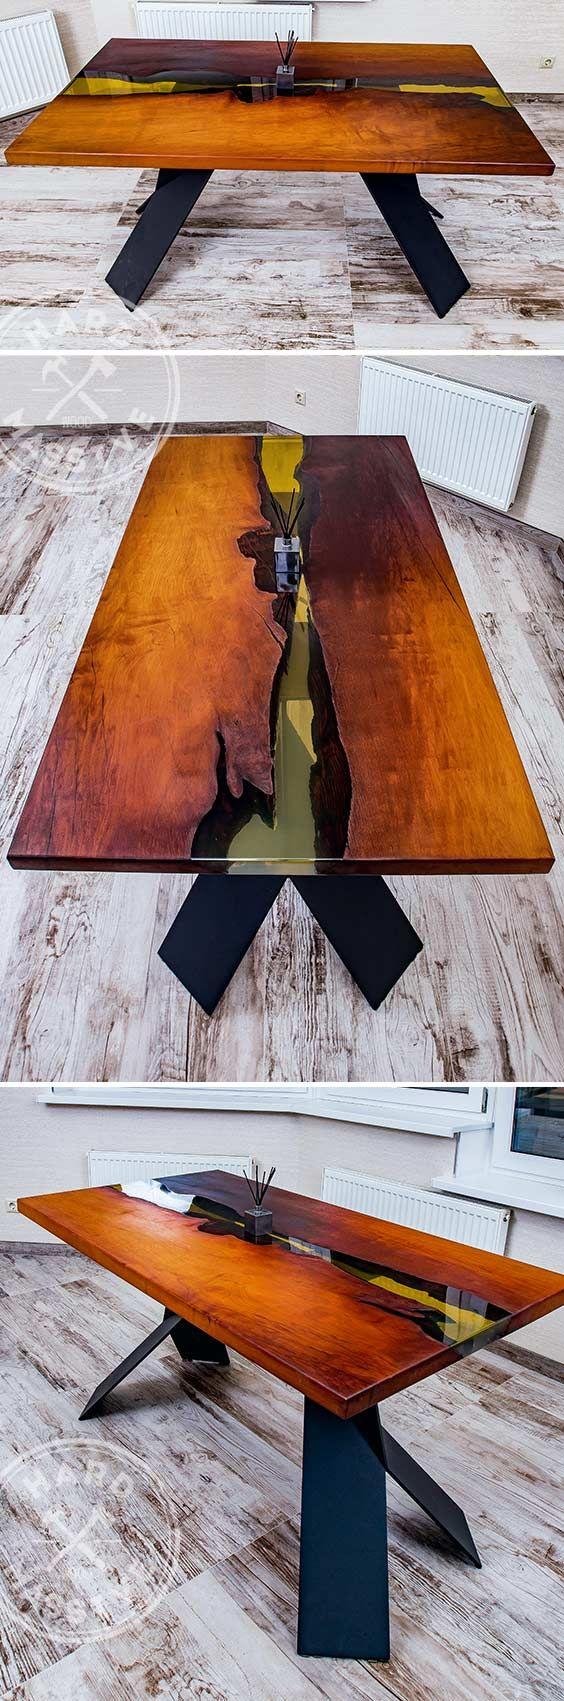 Modern beautiful dining table made of slabs of wood mountain Graben with a natural edge. The polymer fills as an amber-colored River. Original Metal base | Красивый обеденный стол из слэбов дерева горного Граба с натуральным краем. Полимерная заливка в виде реки янтарного цвета. Оригинальное металическое подстолье. #tablewoodmetal #tablewooddesign #tableriver #tableglasswood